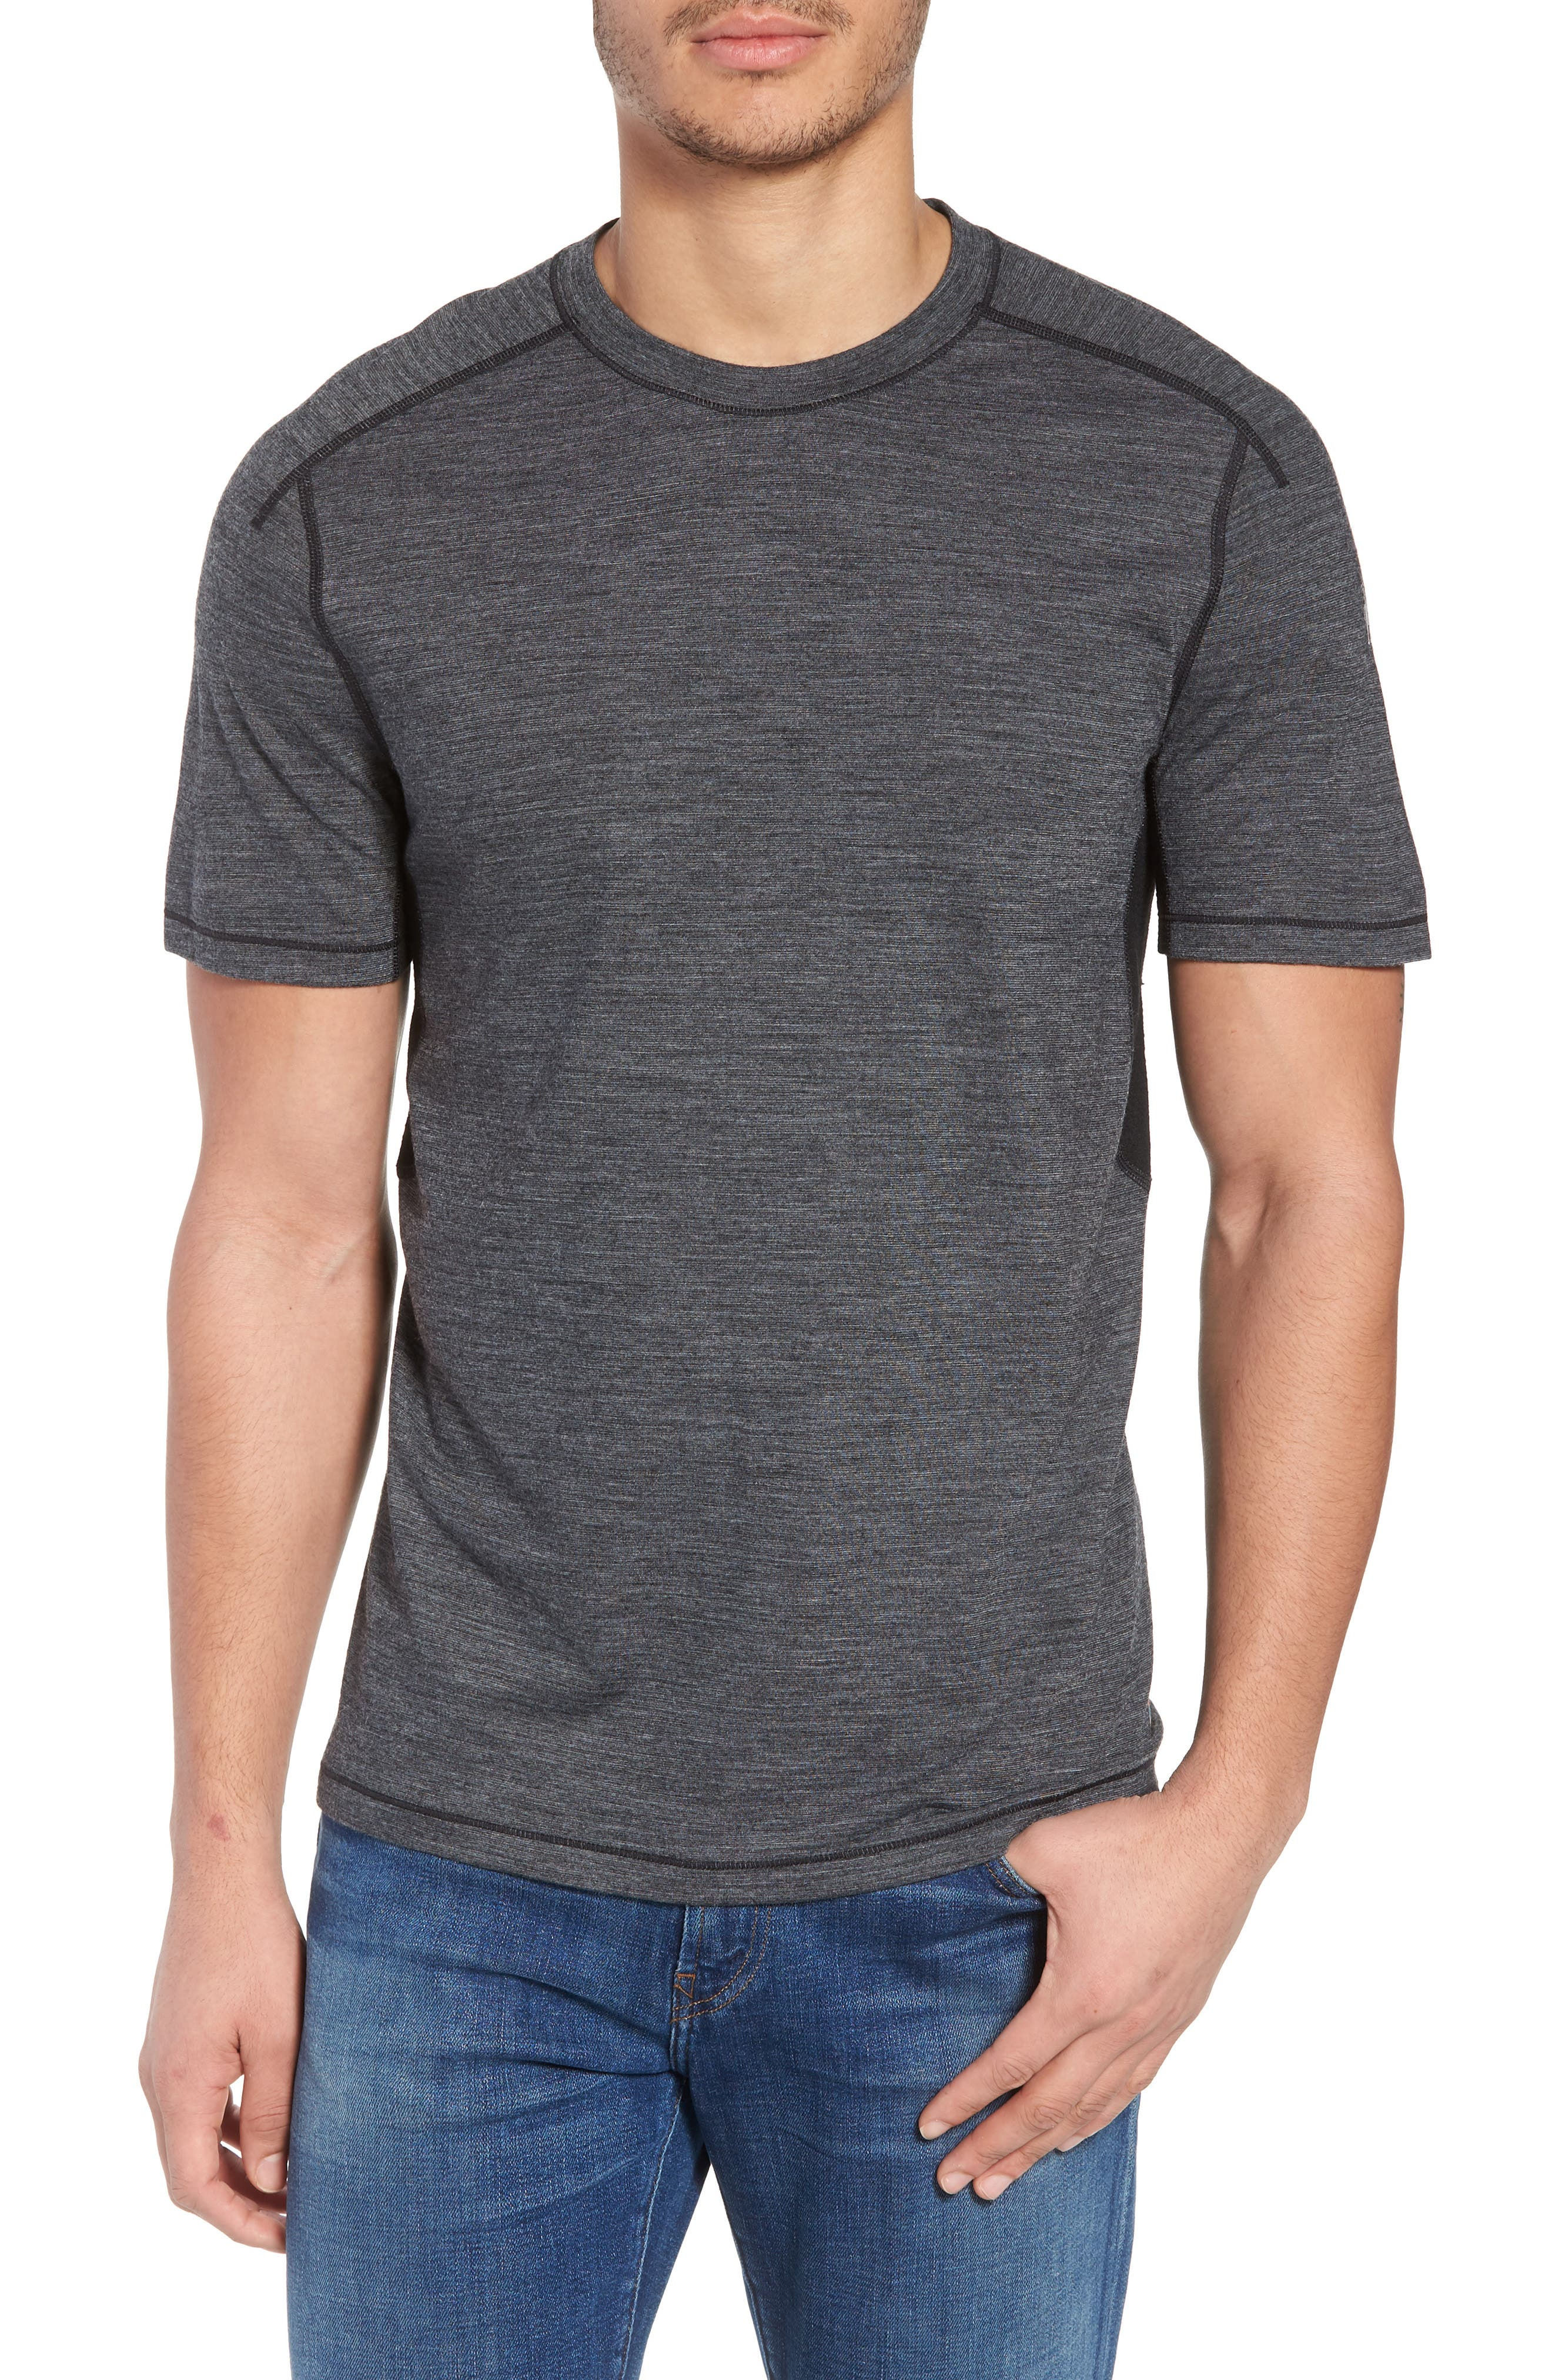 PhD<sup>®</sup> Ultra-Light T-Shirt,                             Main thumbnail 1, color,                             020